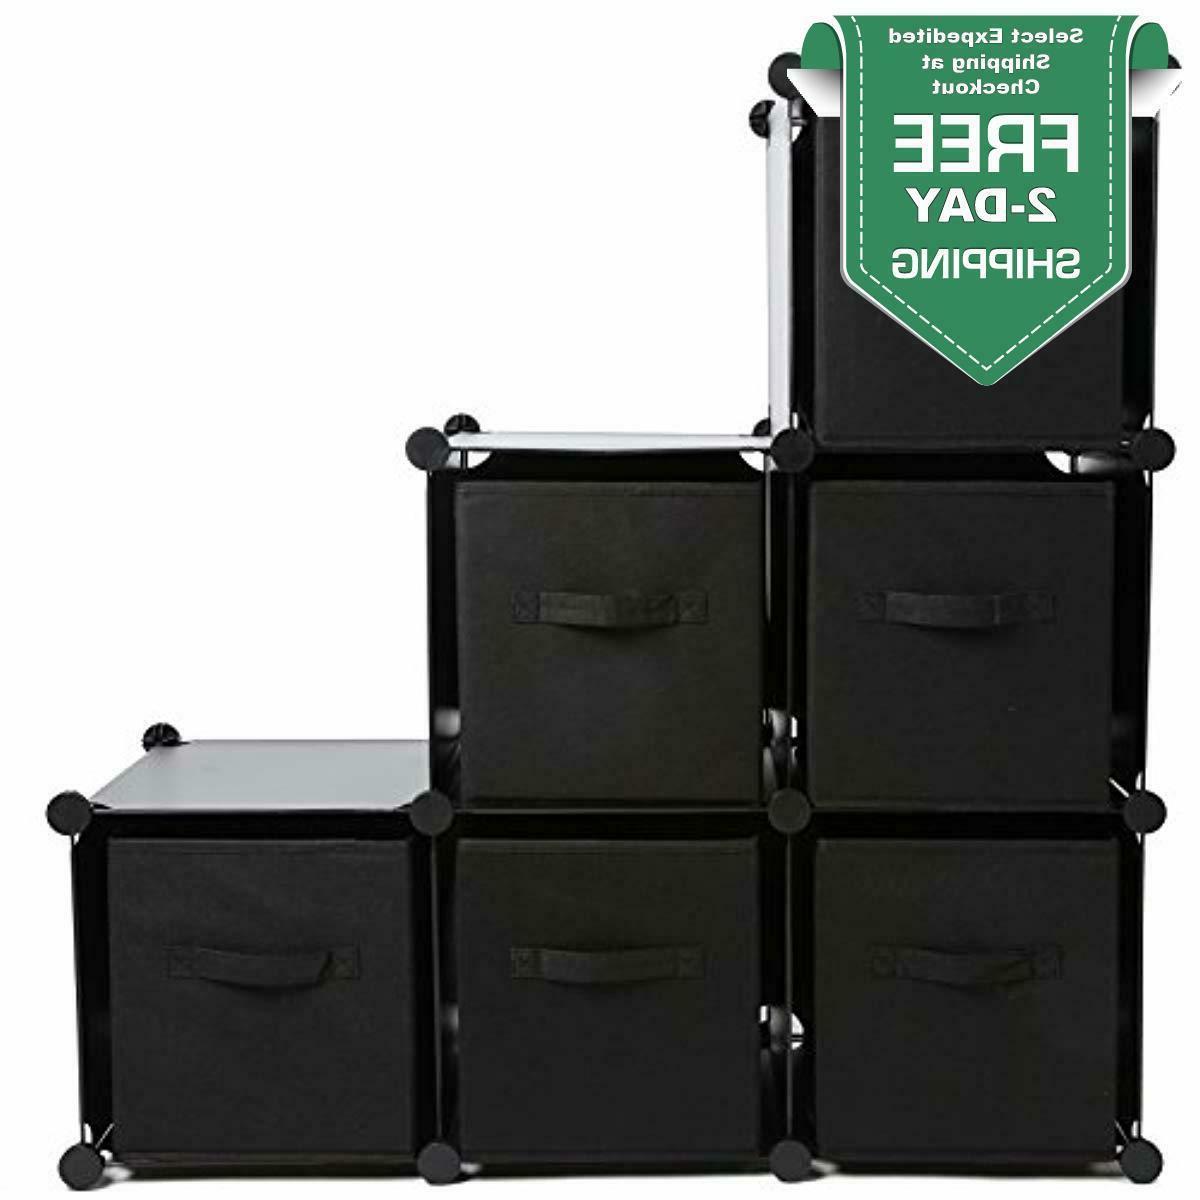 Foldable Storage Organizer Basket Bins Shelf